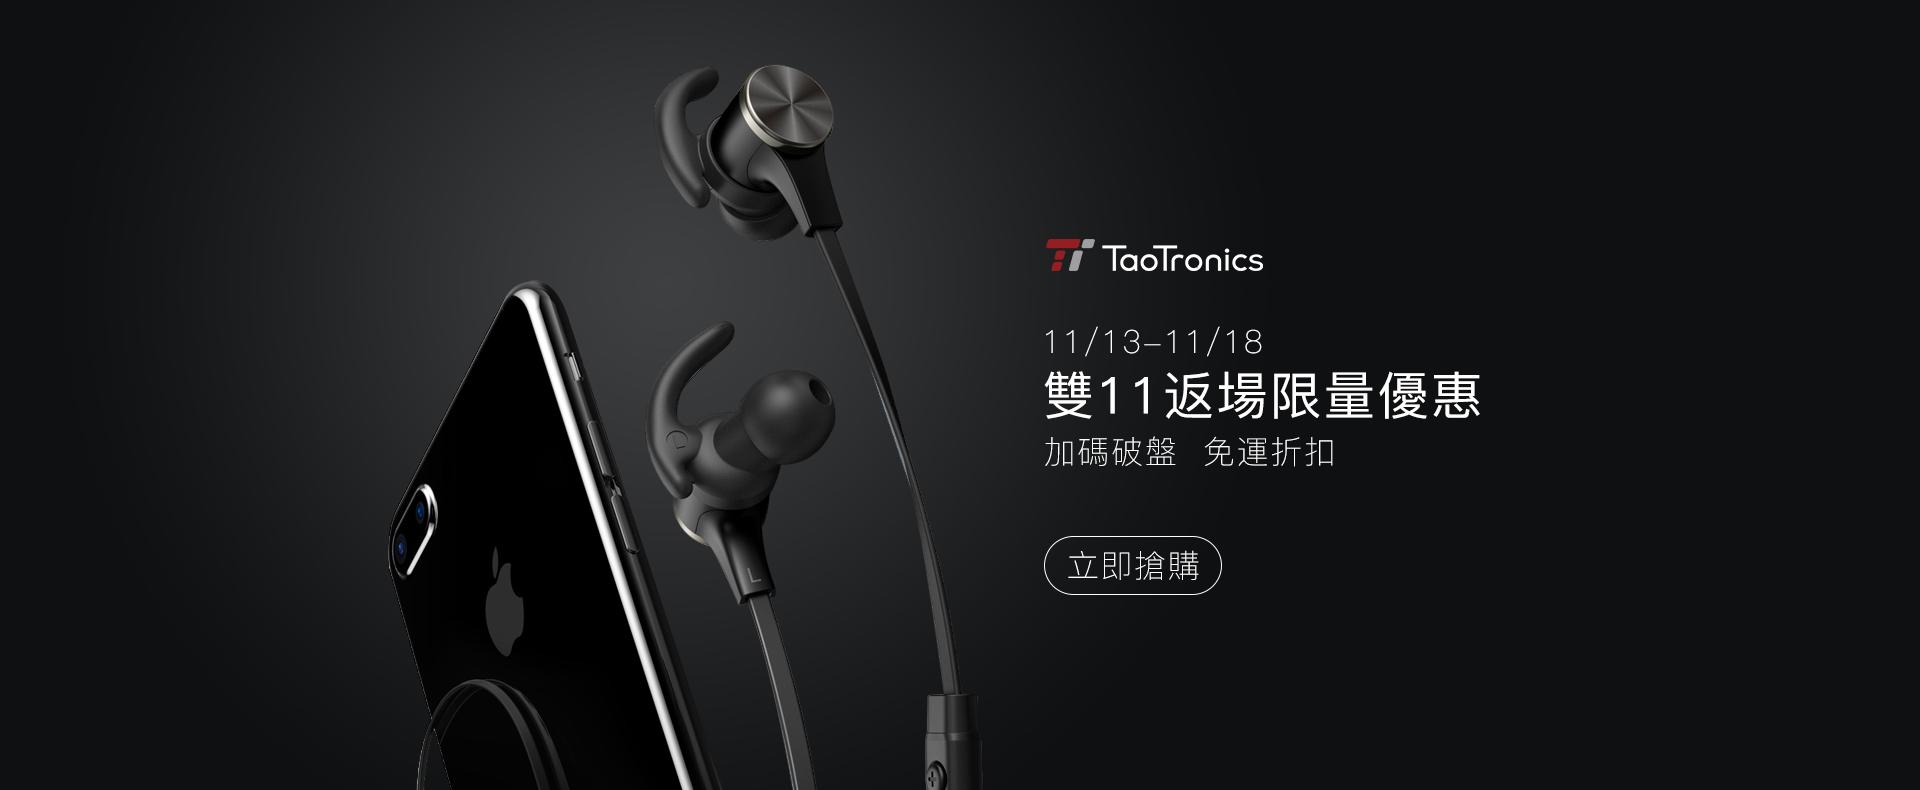 TaoTronics TT-BH07 | 雙11返場限時破盤下殺及免運優惠